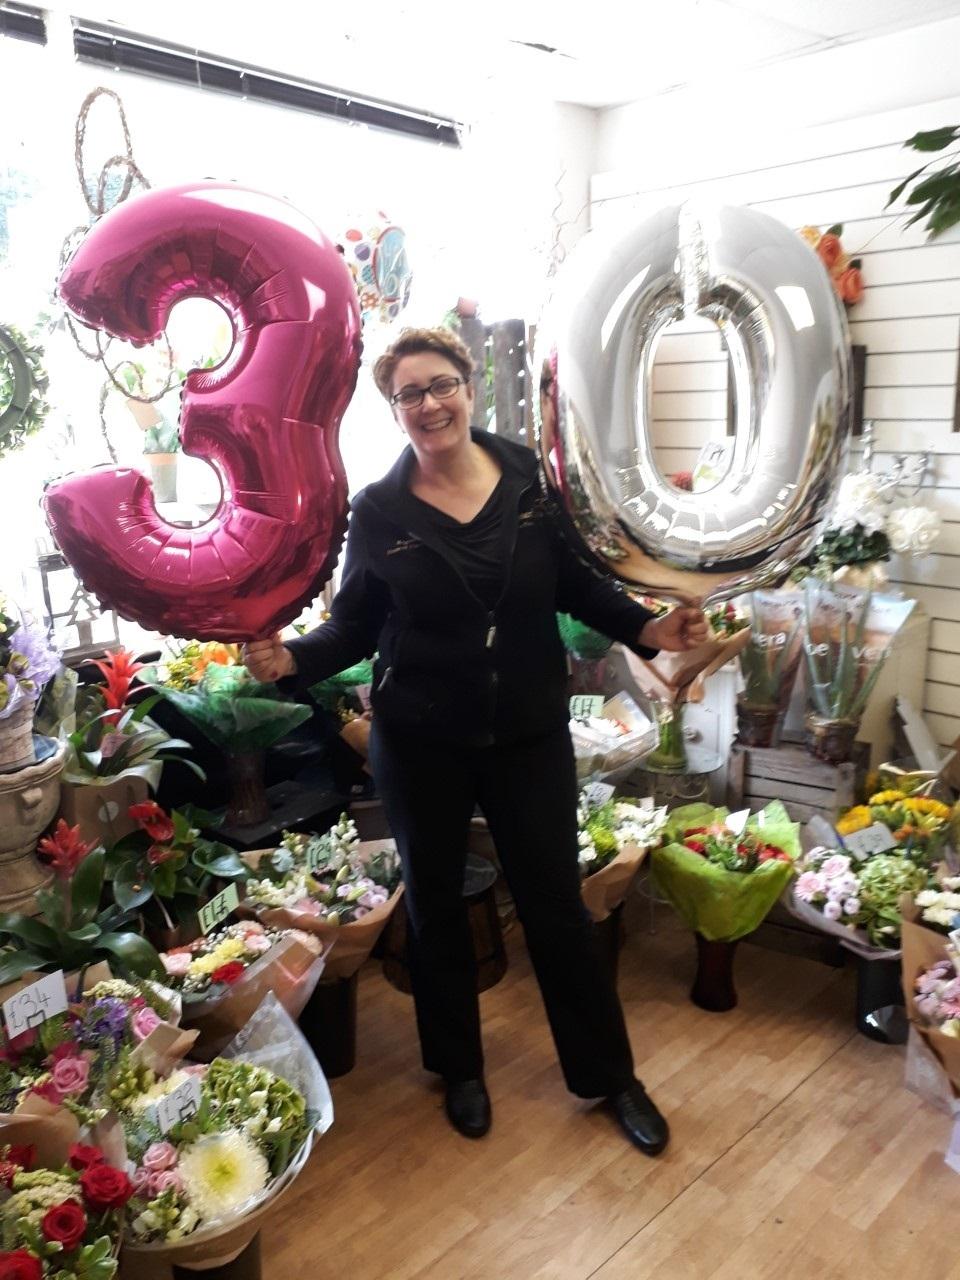 Wrexham florist to celebrate milestone with 30 mile charity swim